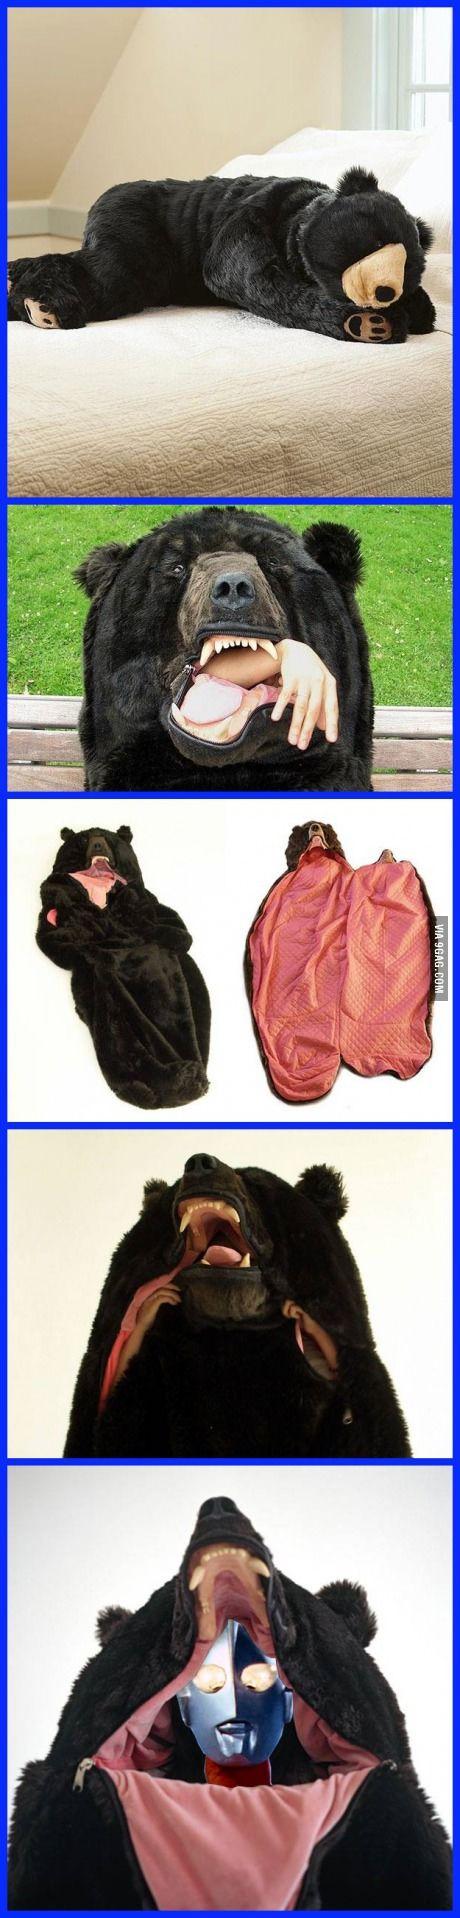 A Bear Sleeping Bag                                                                                                                                                                                 More